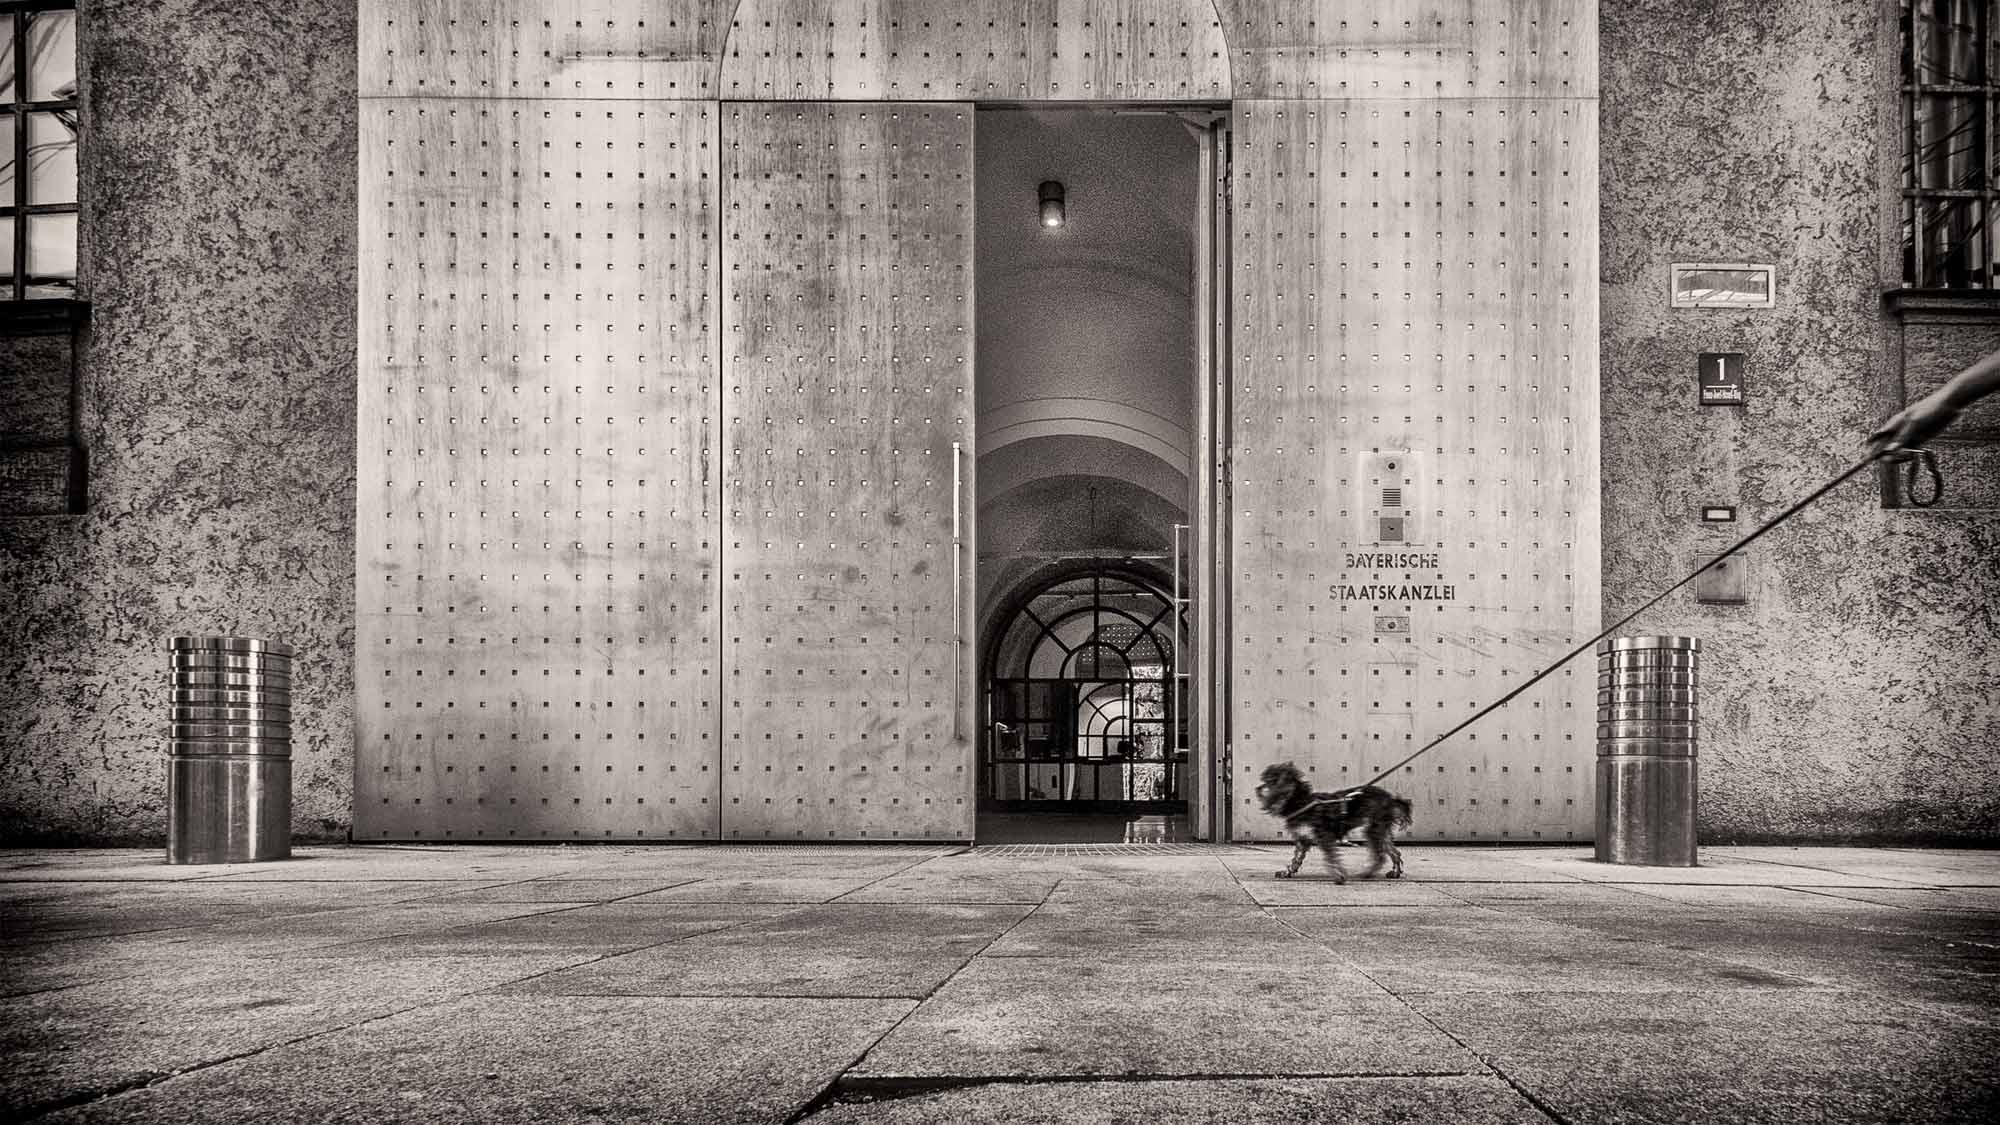 wp-Galerie-street-120